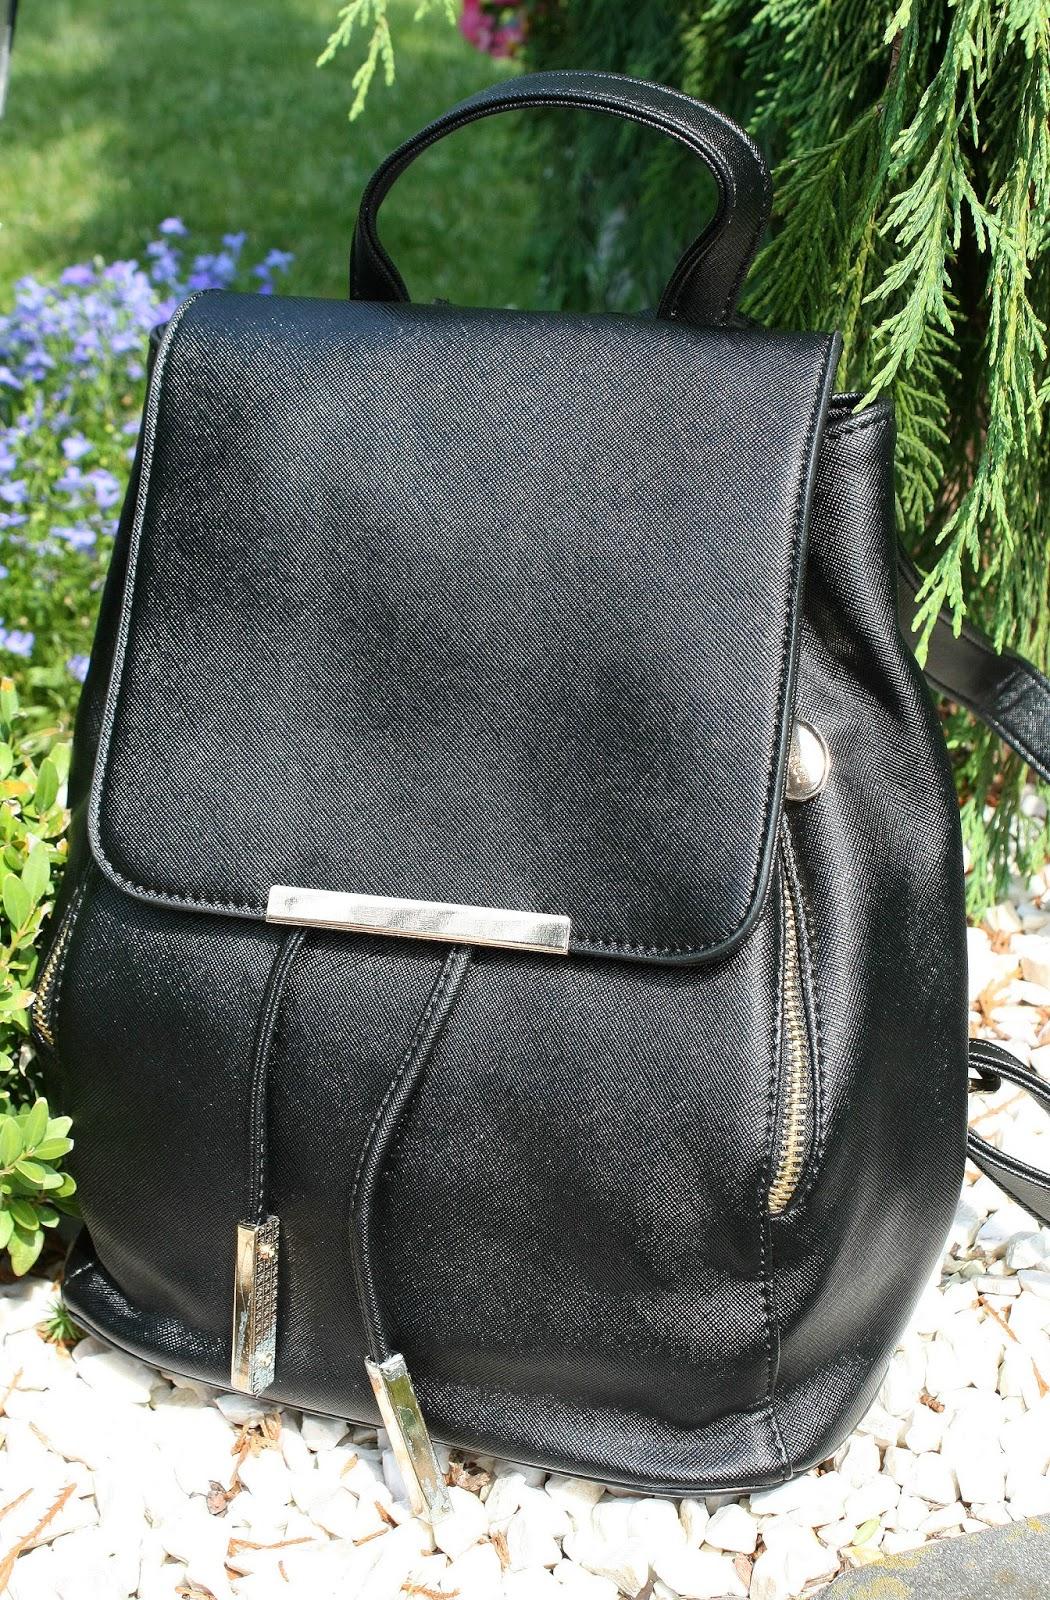 http://www.dresslily.com/drawstring-design-satchel-for-women-product1411362.html?lkid=1505435